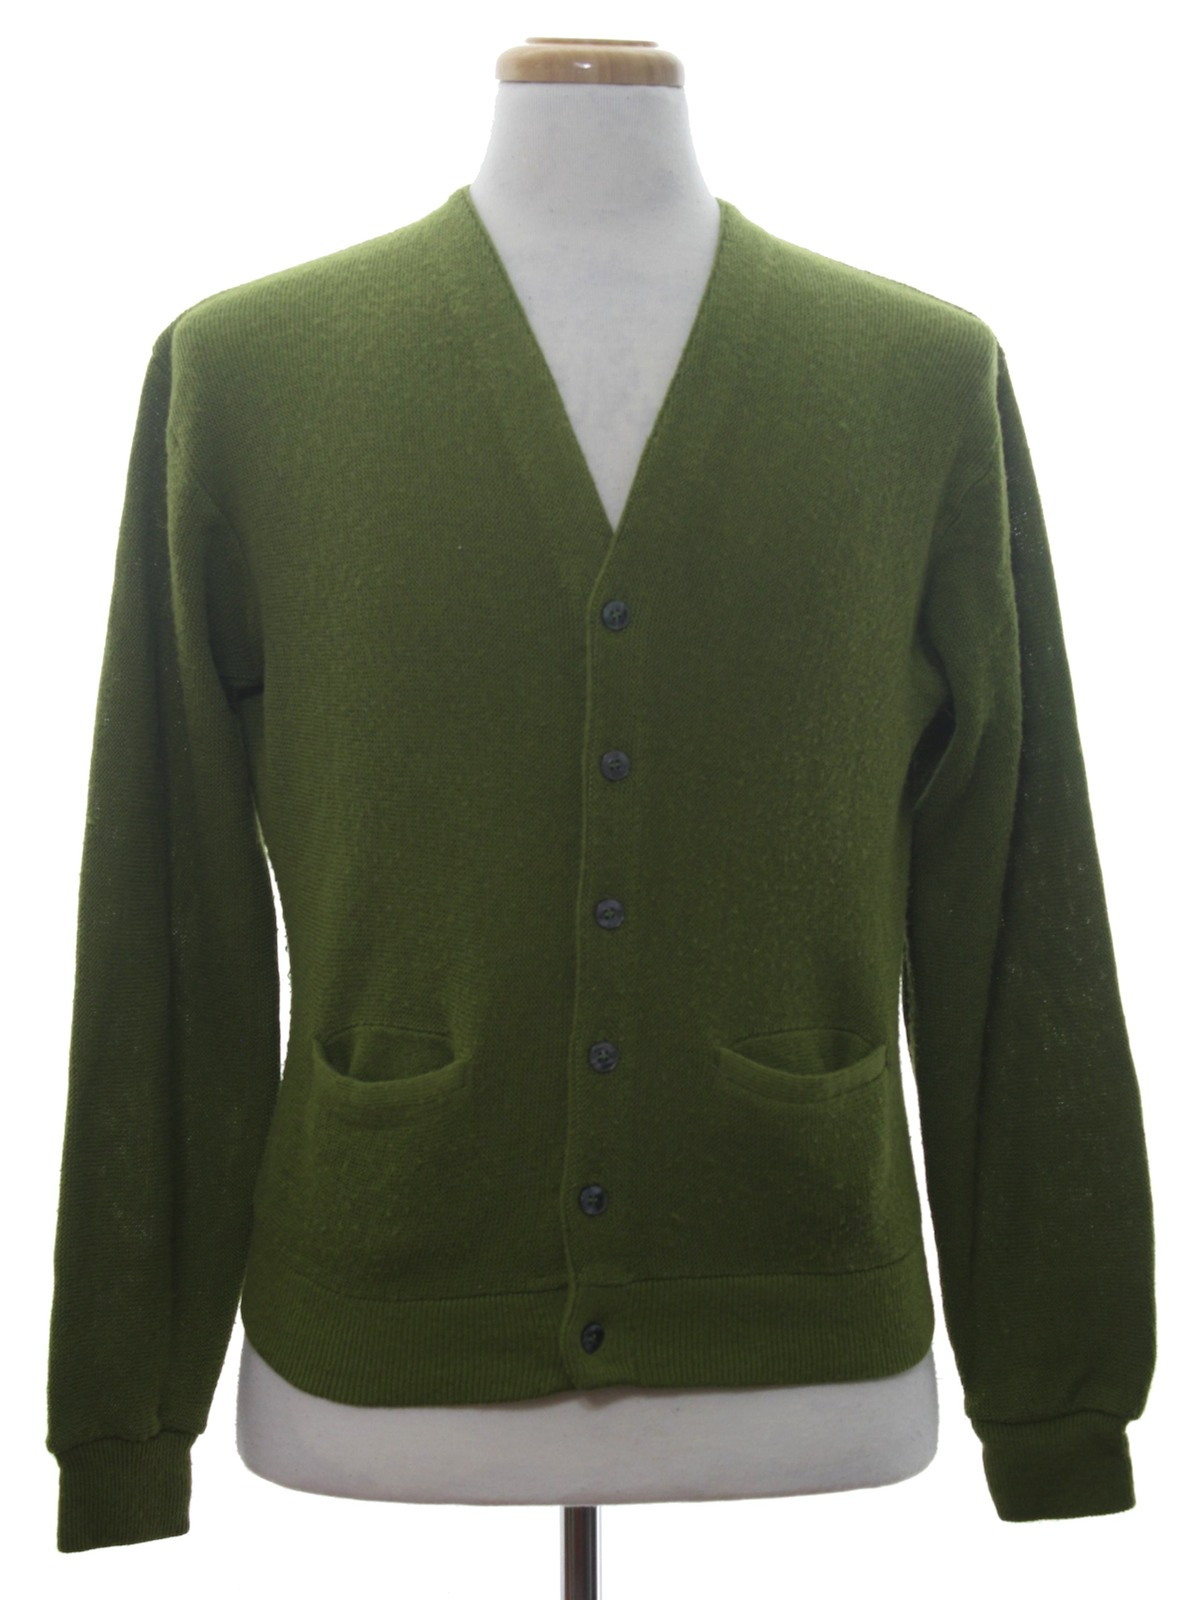 1970's Hanes Pros Choice Mens Cardigan Sweater